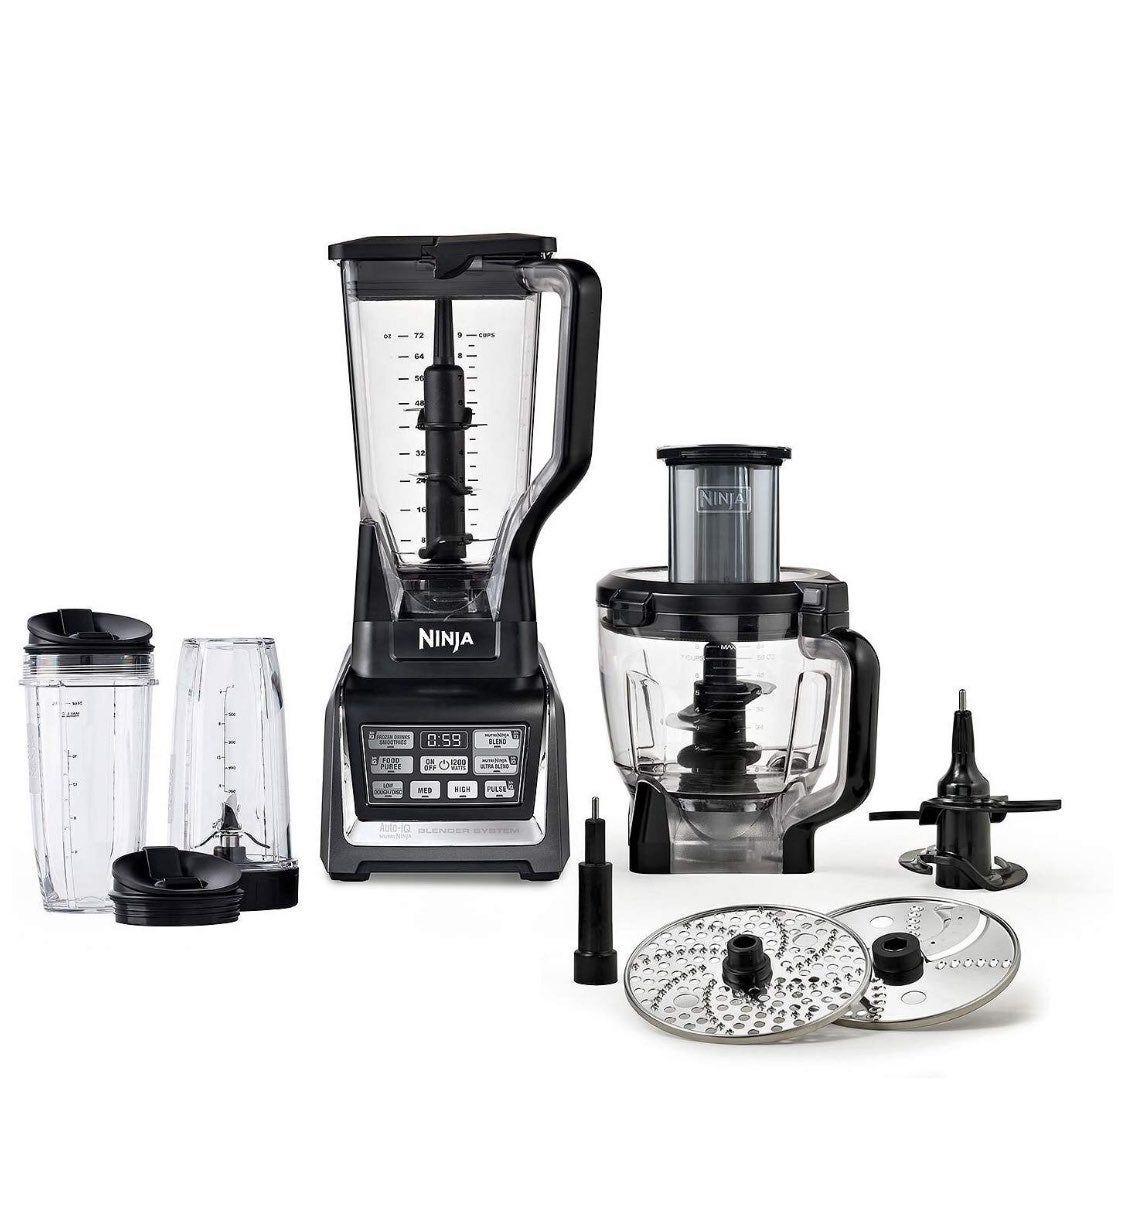 Brand new ninja kitchen system auto iq one touch